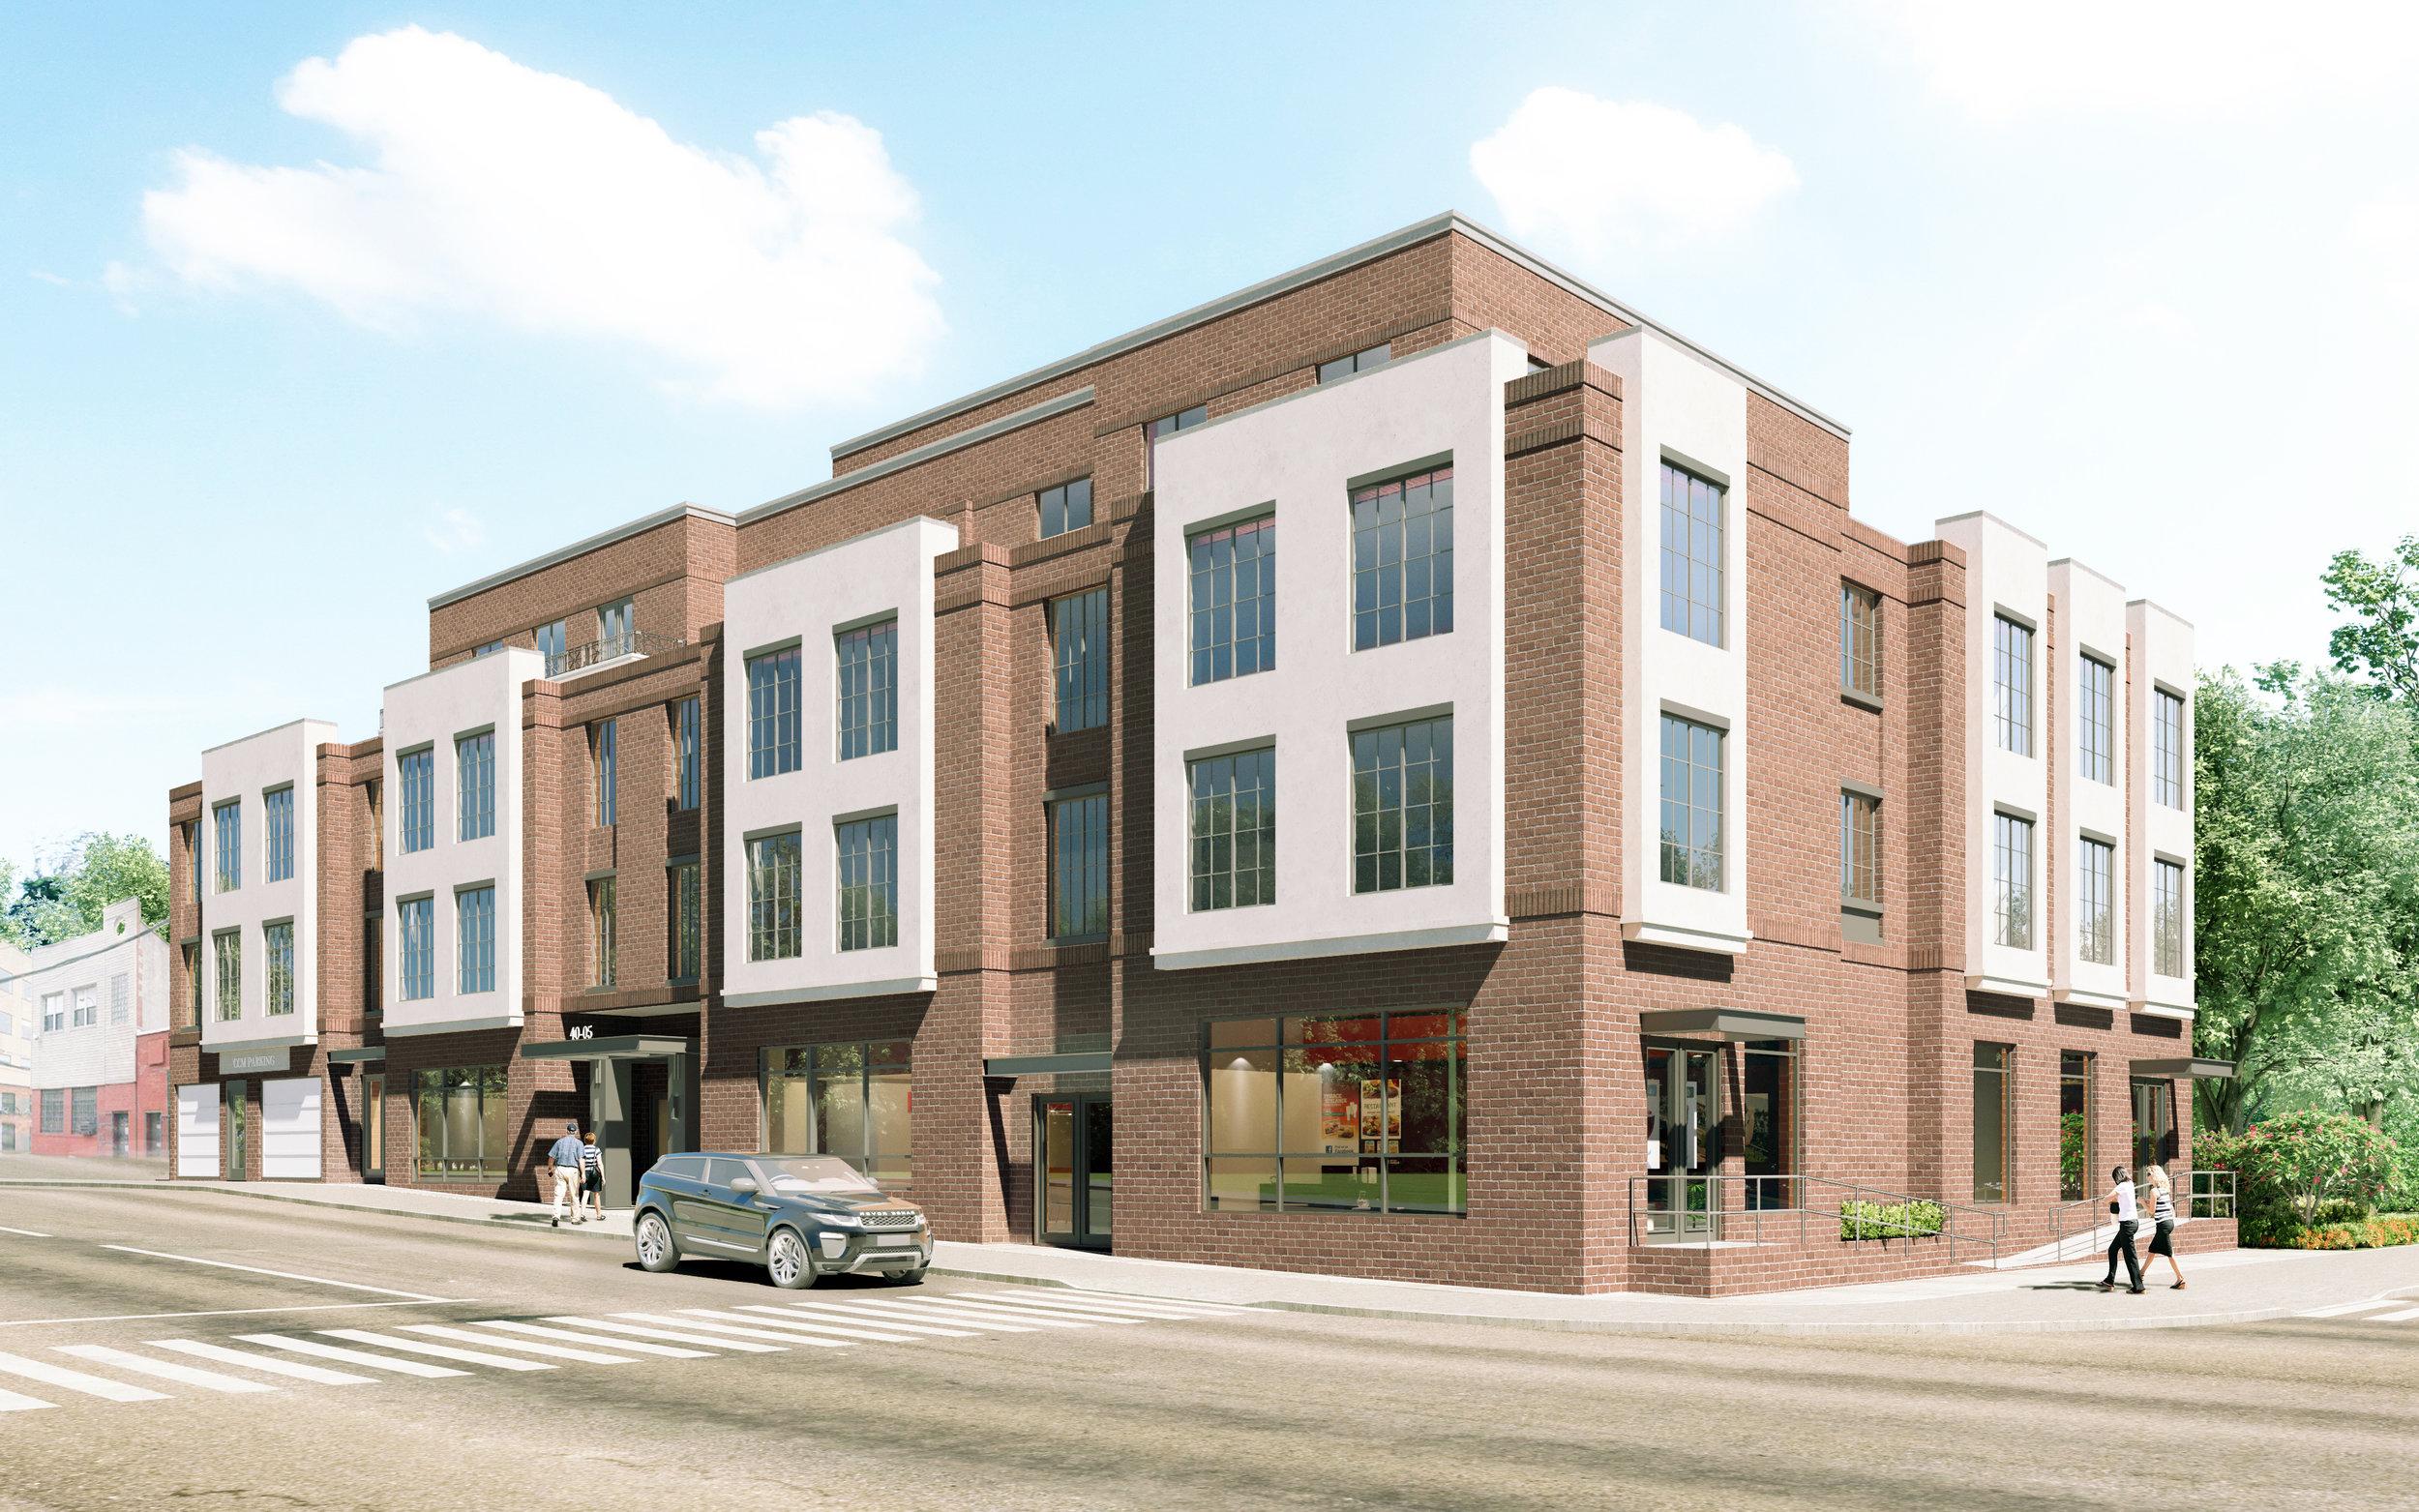 4005 Crescent Street Exterior Rendering_ FINAL VERSION_2.jpg